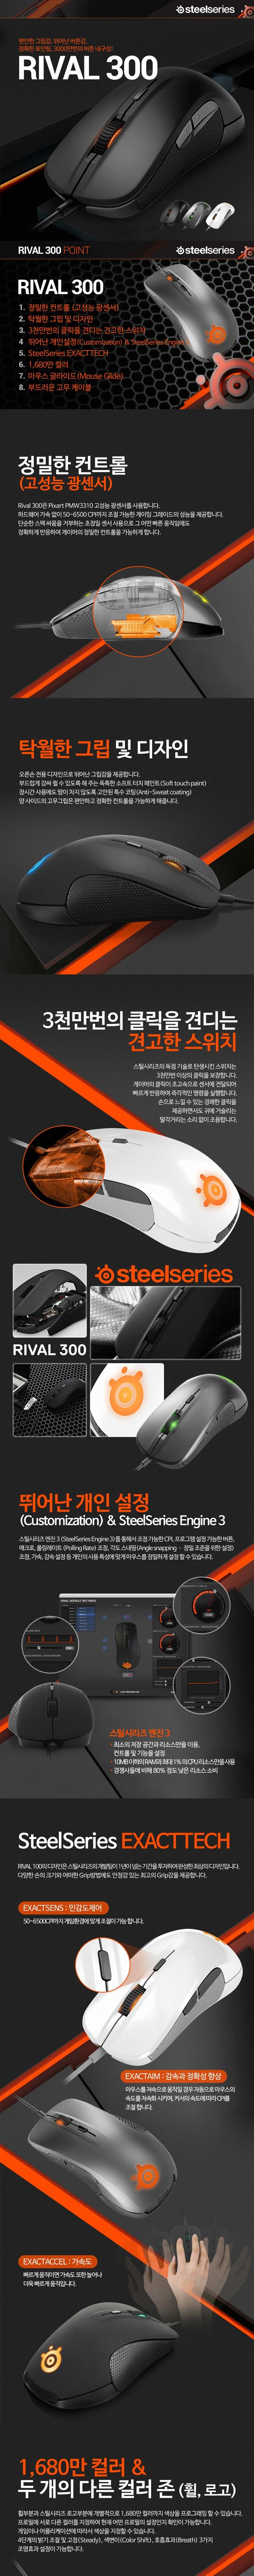 Rival300_1.jpg